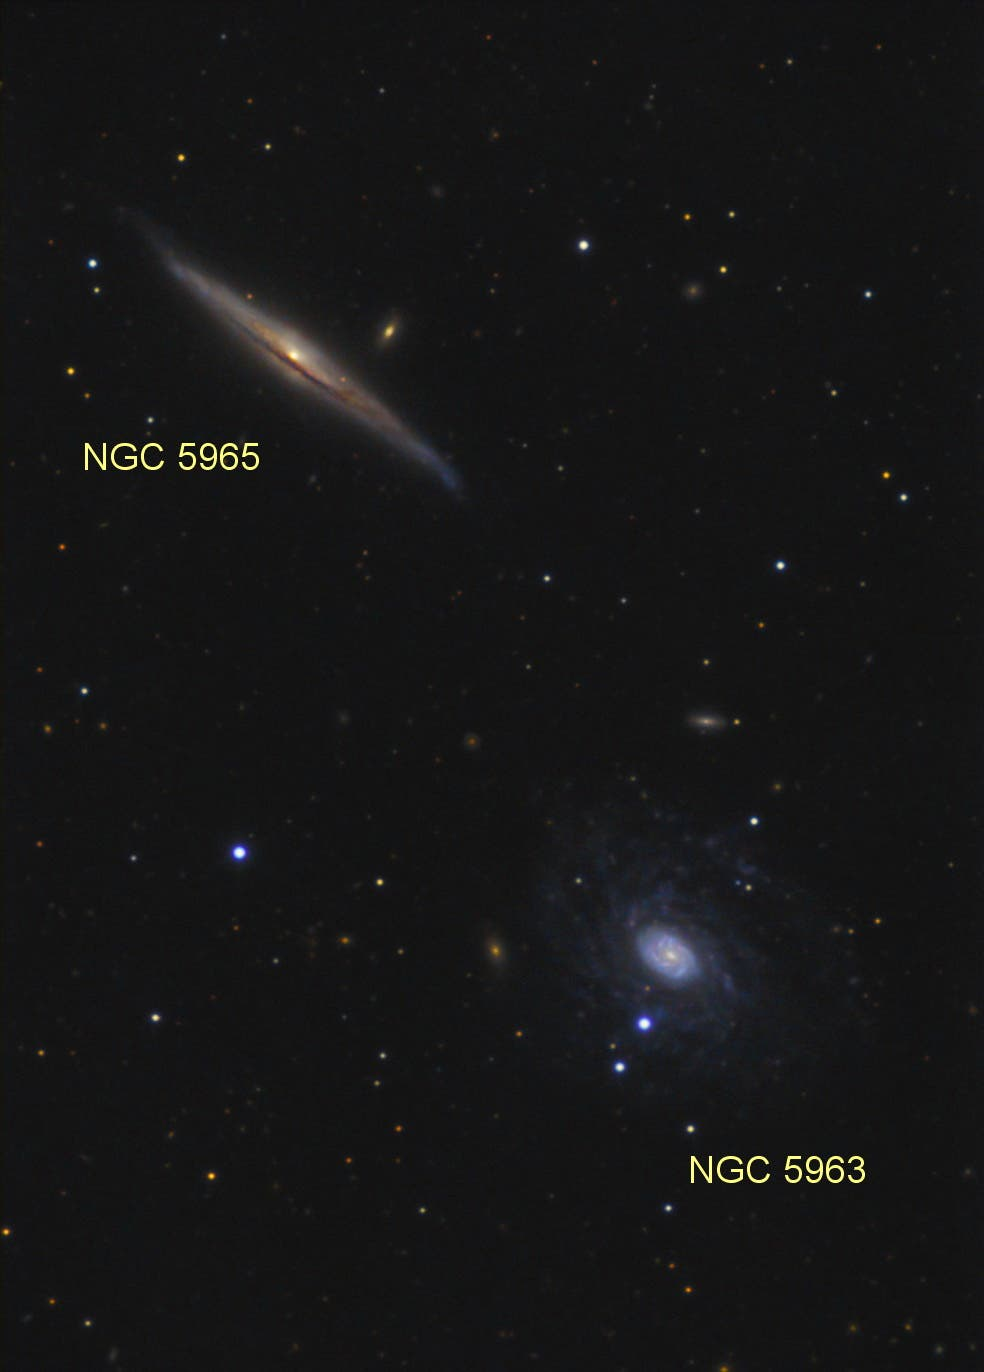 NGC 5963 und NGC 5965 (Objekte)